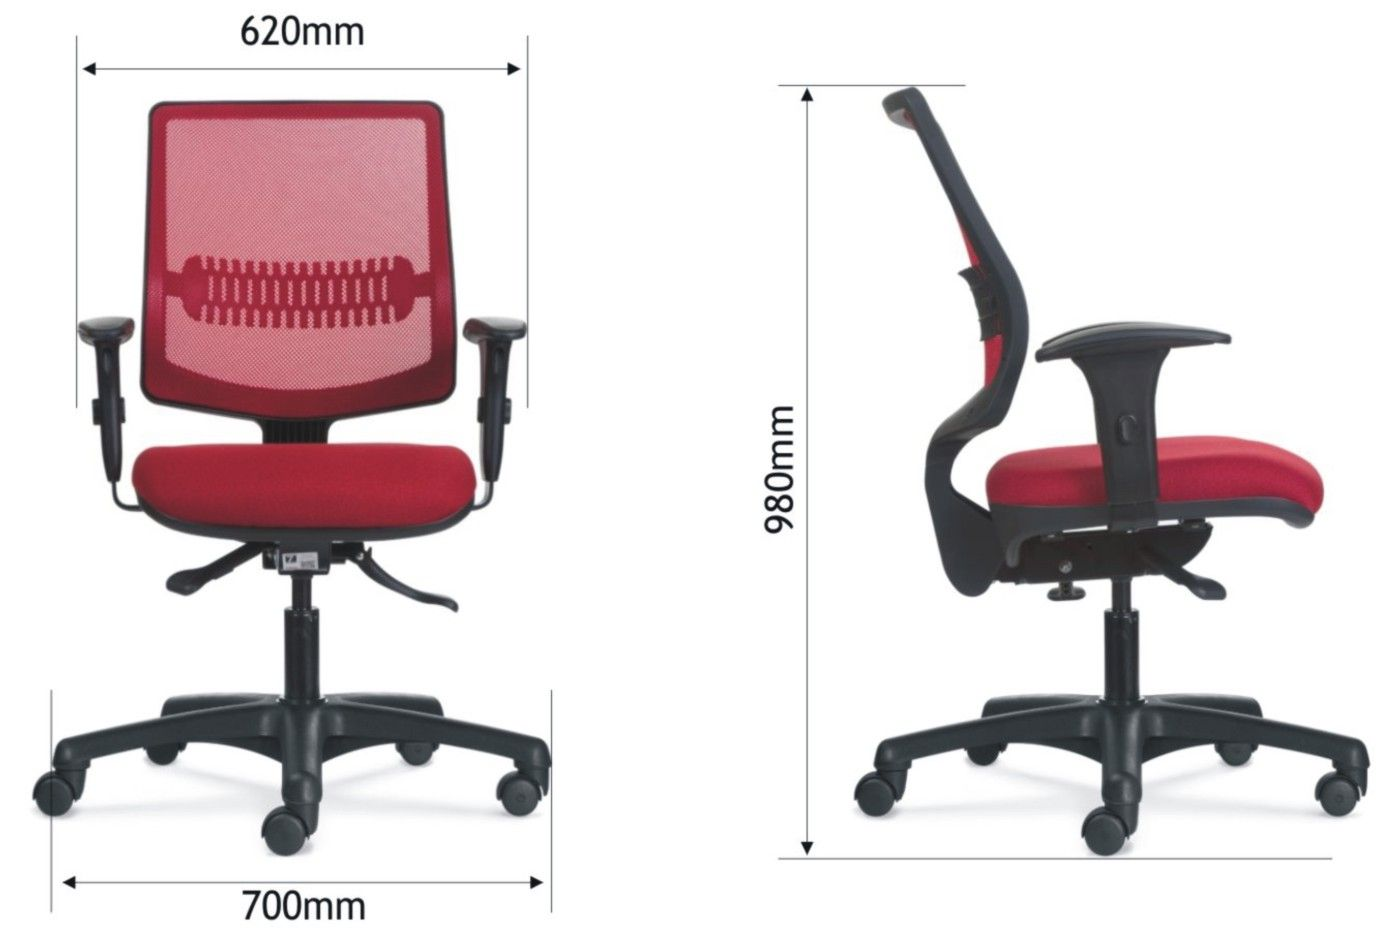 B2w Cadeira Flexform Uni Me Red R 485 19 Frete